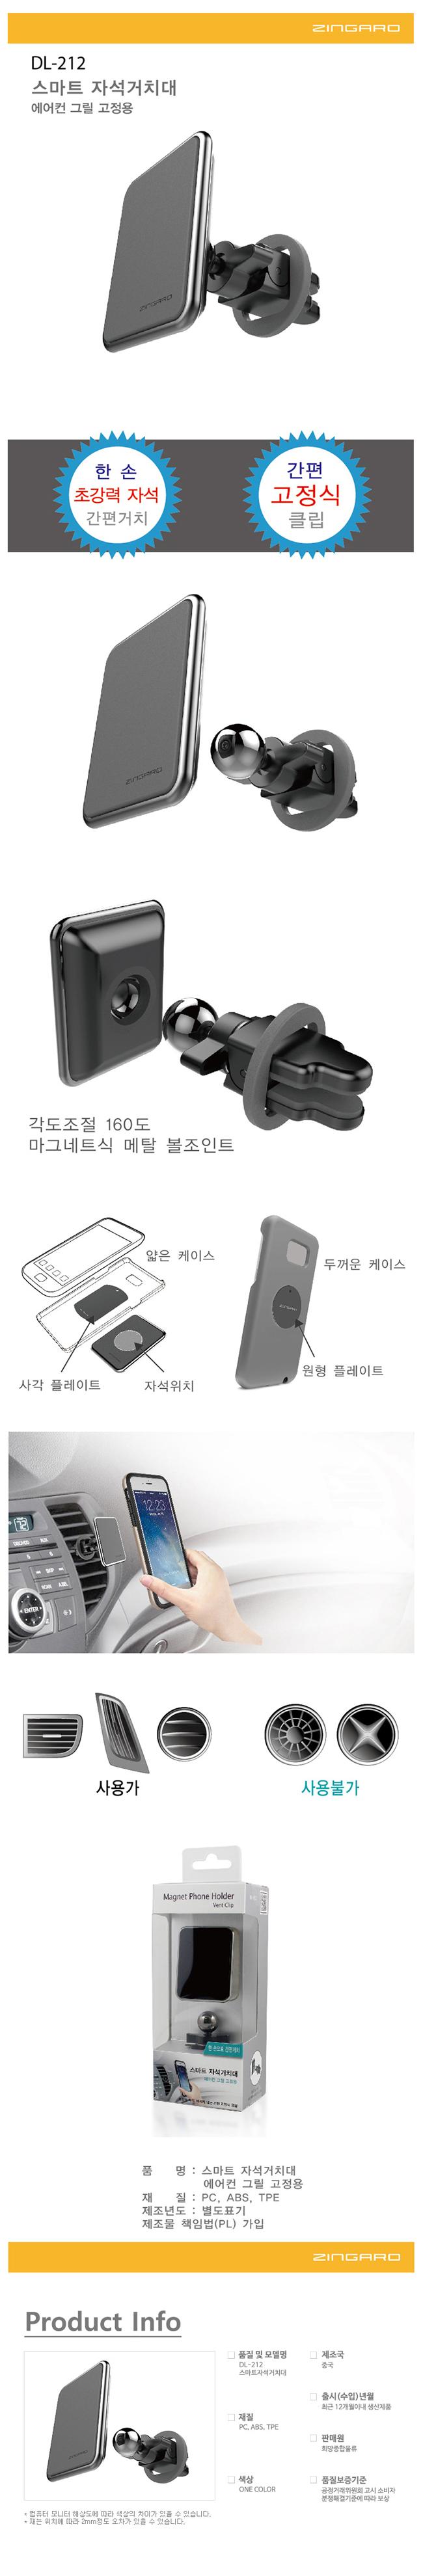 [Ritz] 릿츠 zingaro 스마트폰 자석거치대(DL-212)